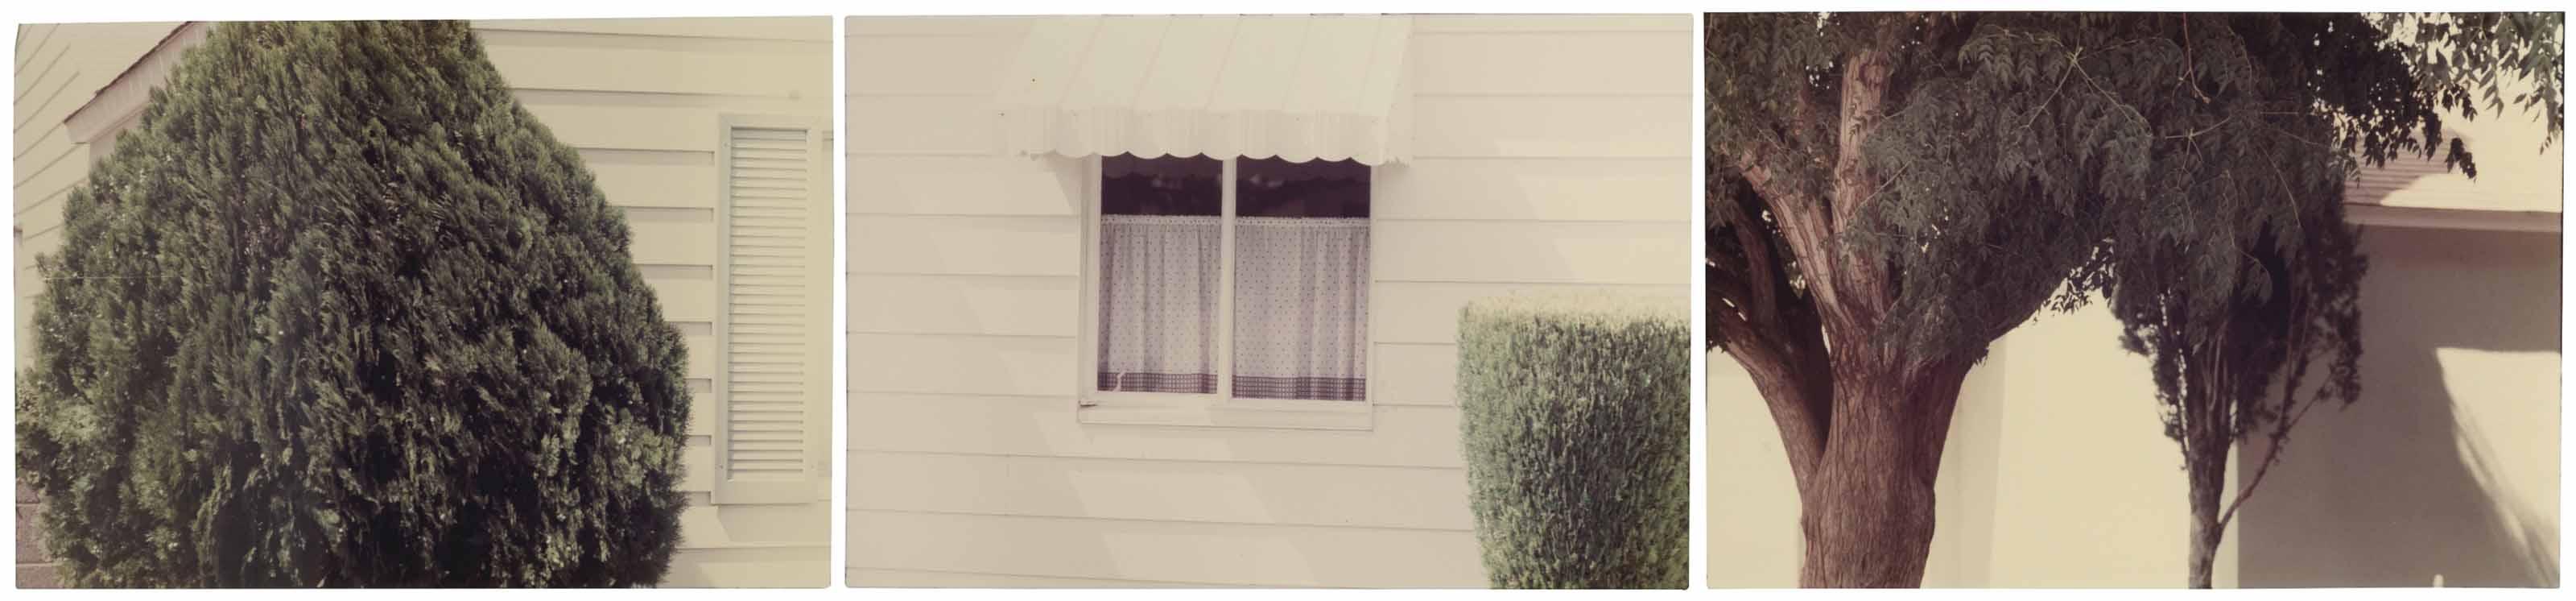 Untitled (Henderson, Nevada), 1977